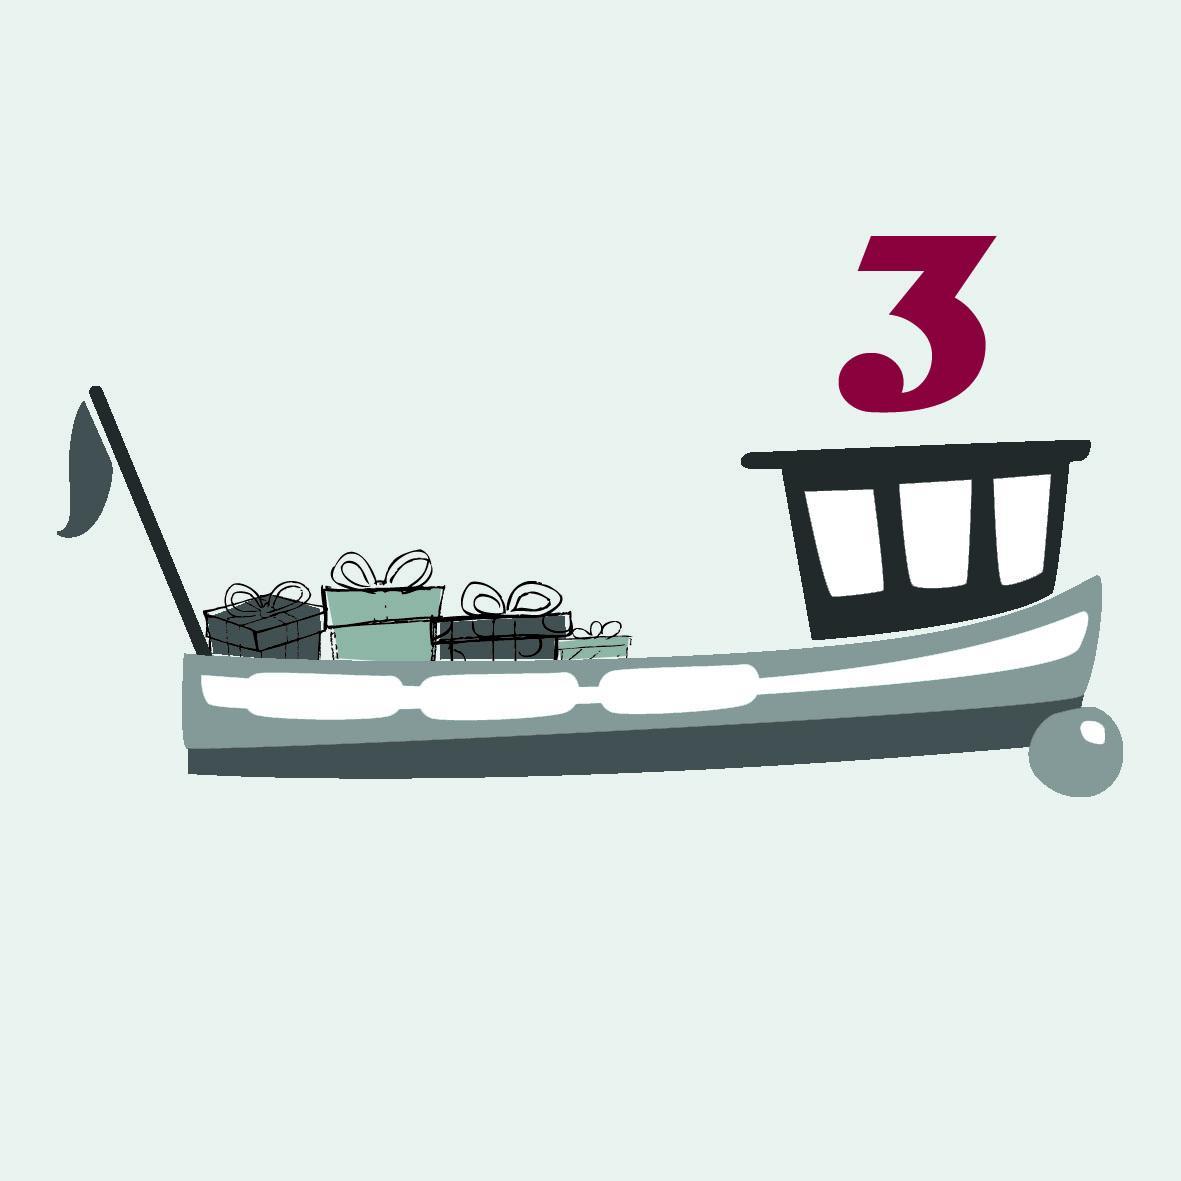 Day 3 of the Seasalt advent calendar! #Win a @rivercottage & @CombeHouseDevon cookery break: http://t.co/5dTPnSuyNj http://t.co/jiL9Ta9ZAx